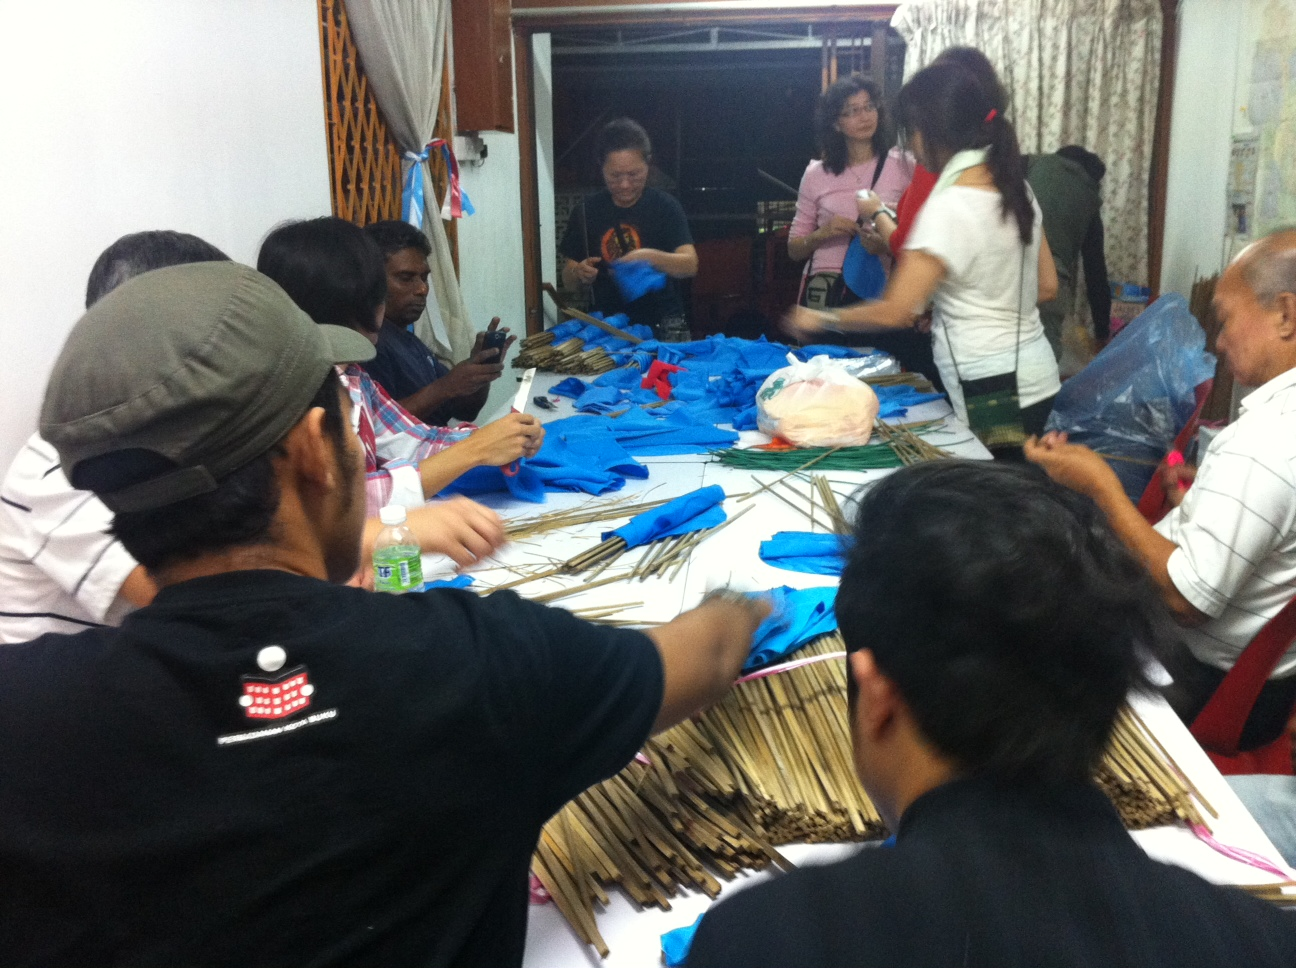 Malaysian Spring volunteers